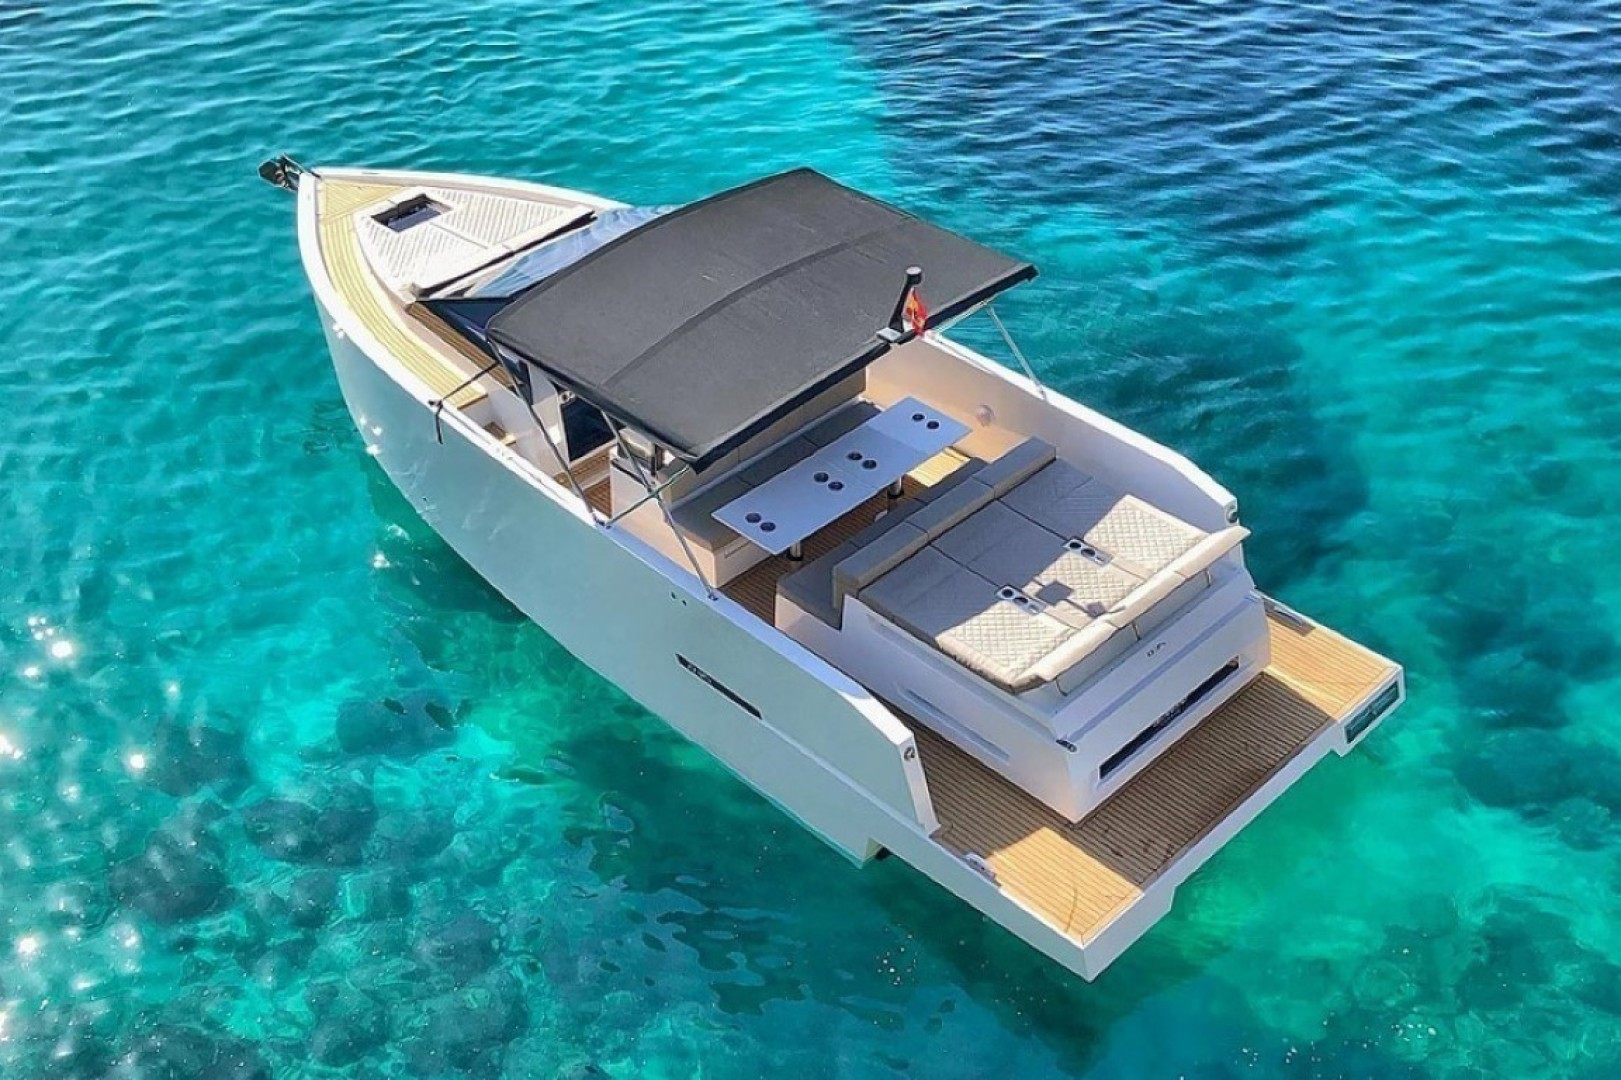 De Antonio-D34 Cruiser 2020-De Antonio Yachts D34 Cruiser Fort Lauderdale-Florida-United States-De Antonio Yachts D34 Cruiser Fort Lauderdale (16)-1549262 | Thumbnail